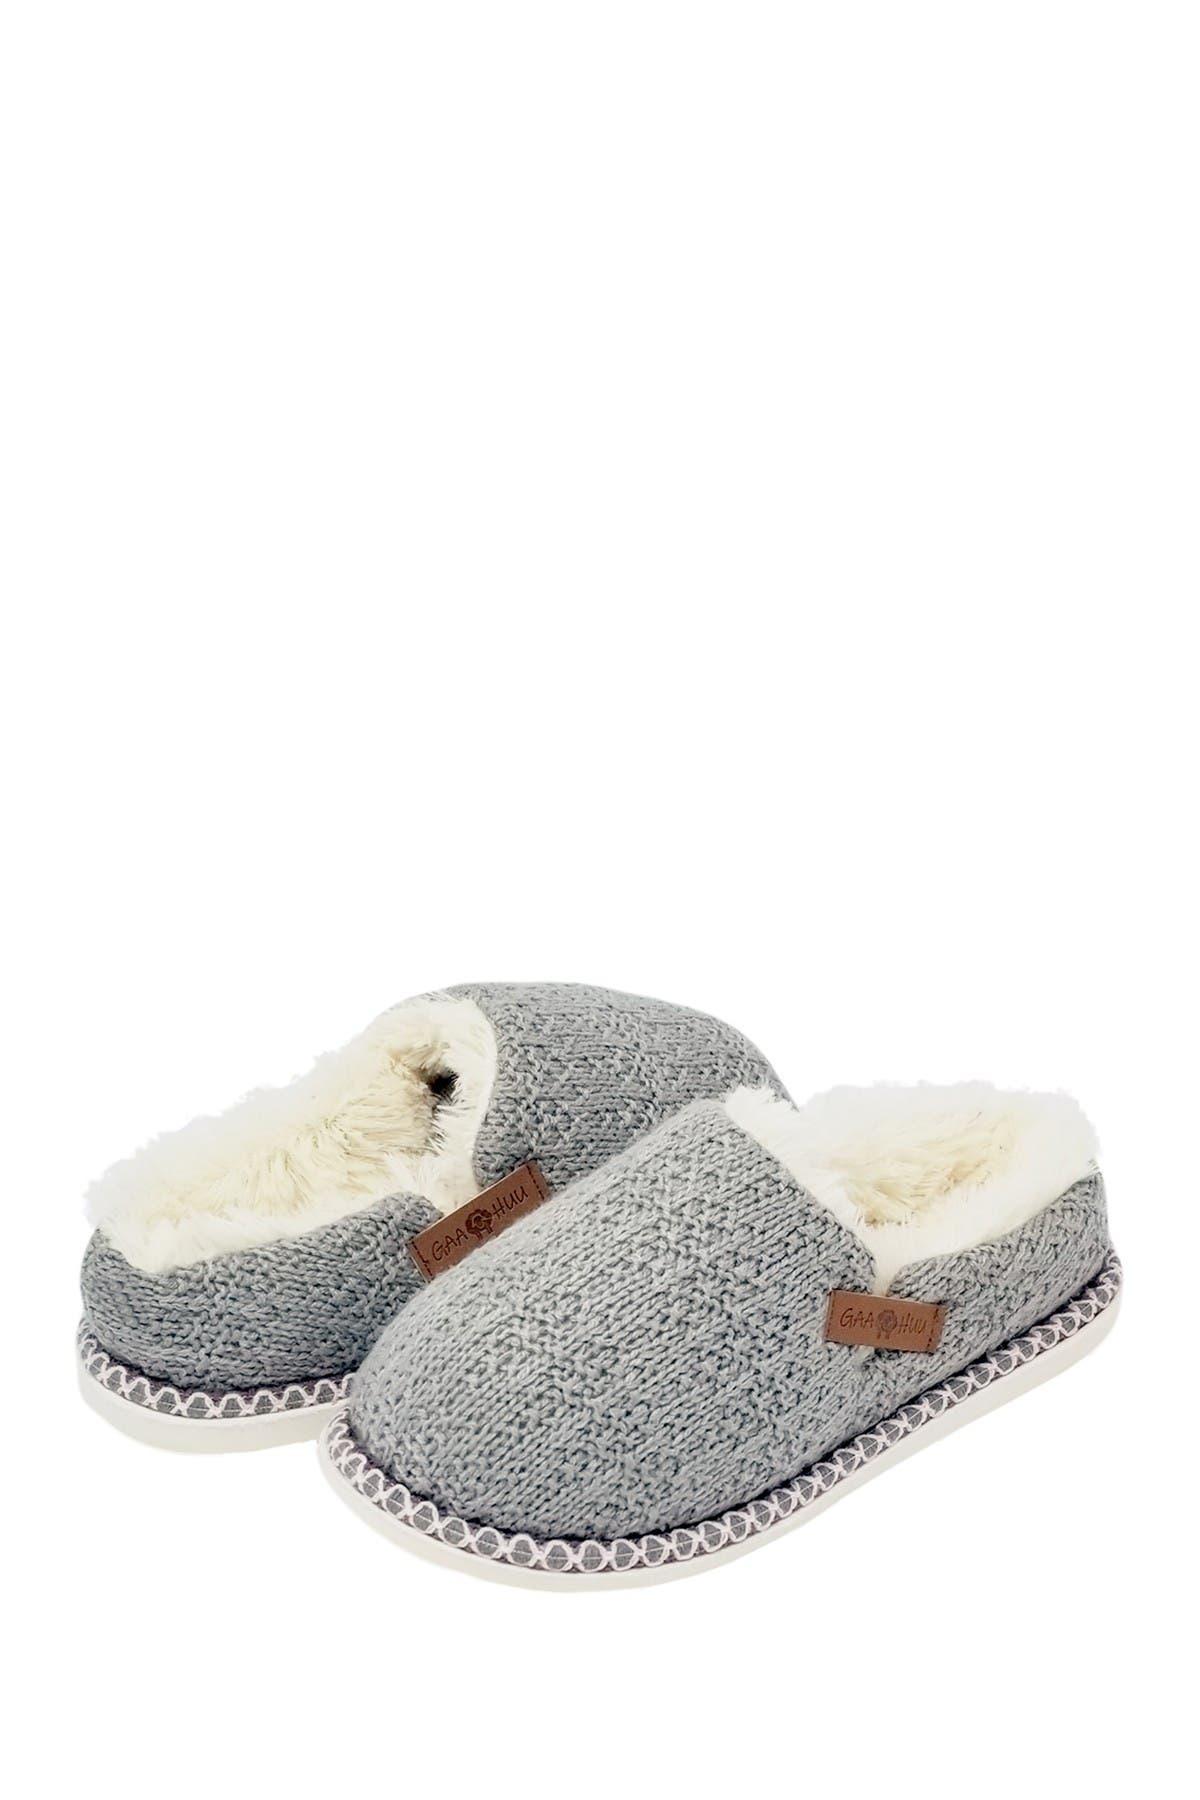 Image of GAAHUU Textured Knit Clog Slipper